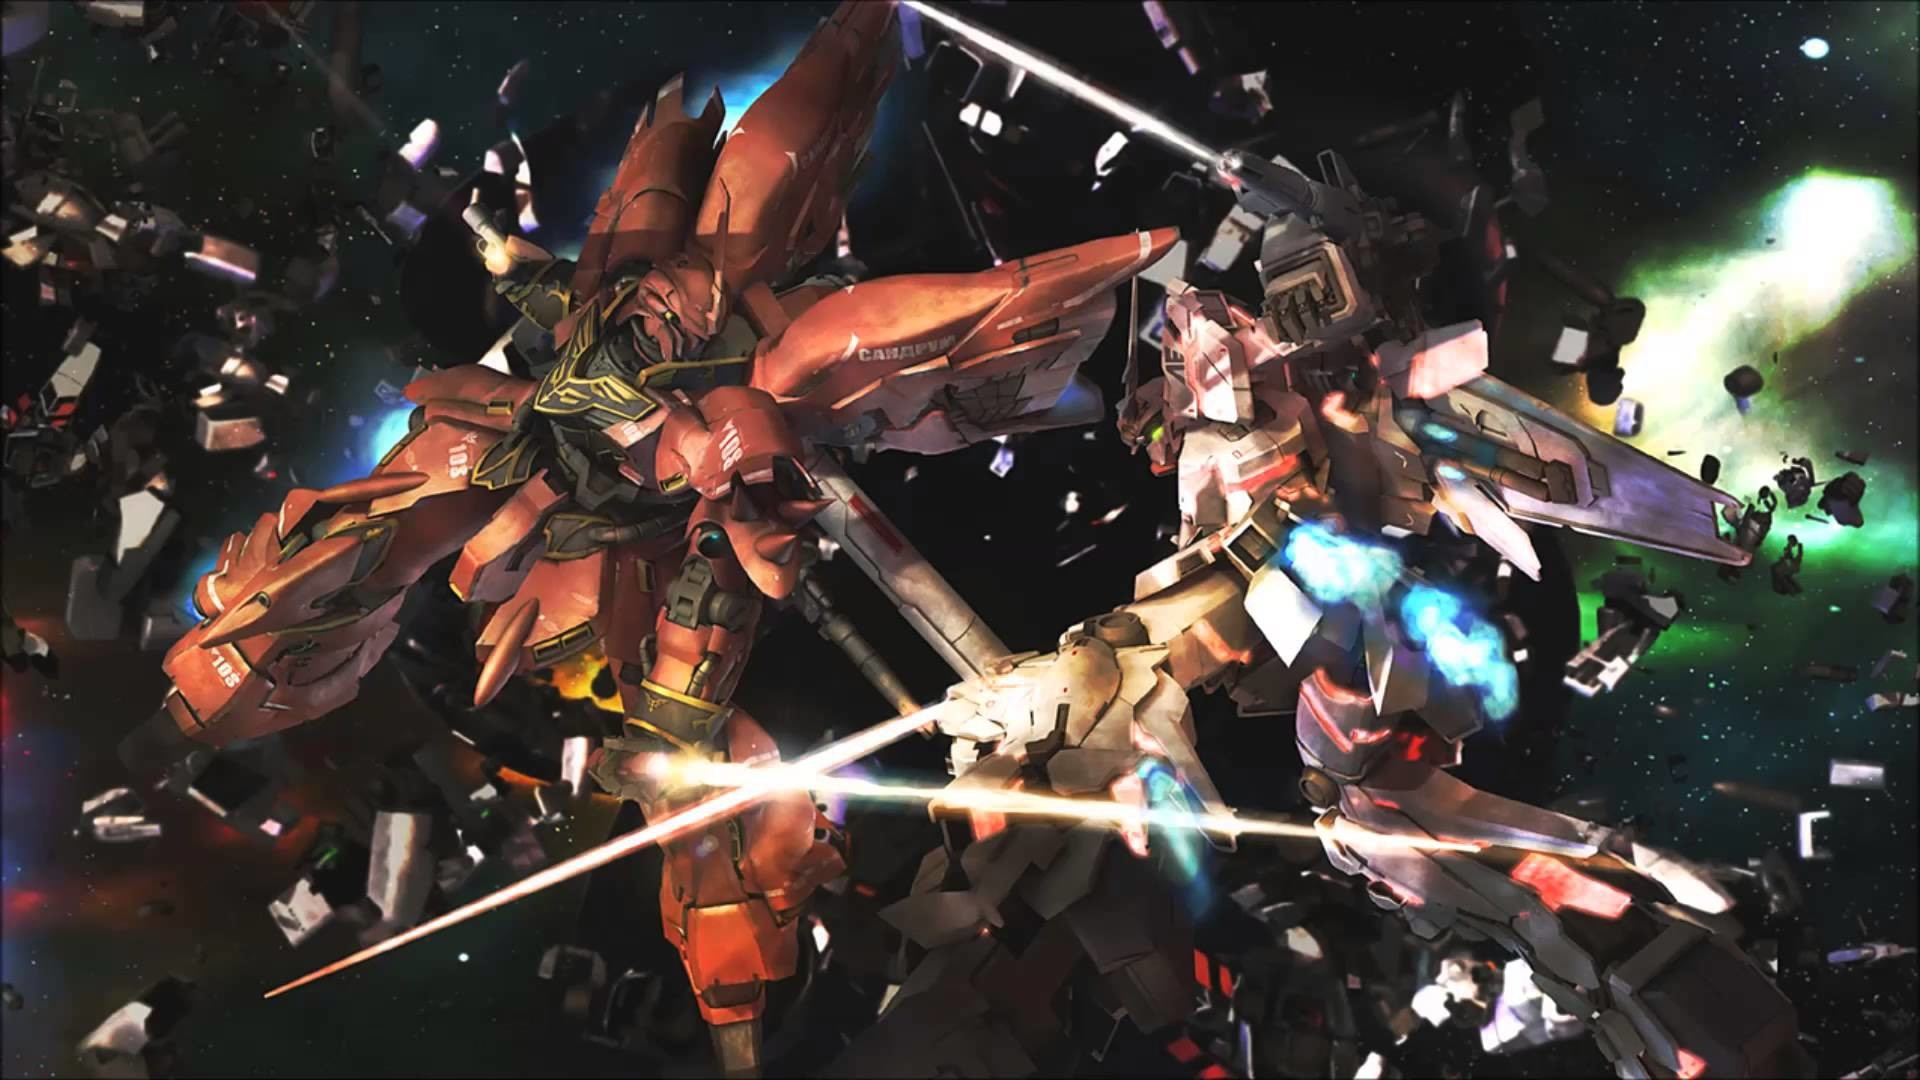 Mobile Suit Gundam Extreme vs Force Image